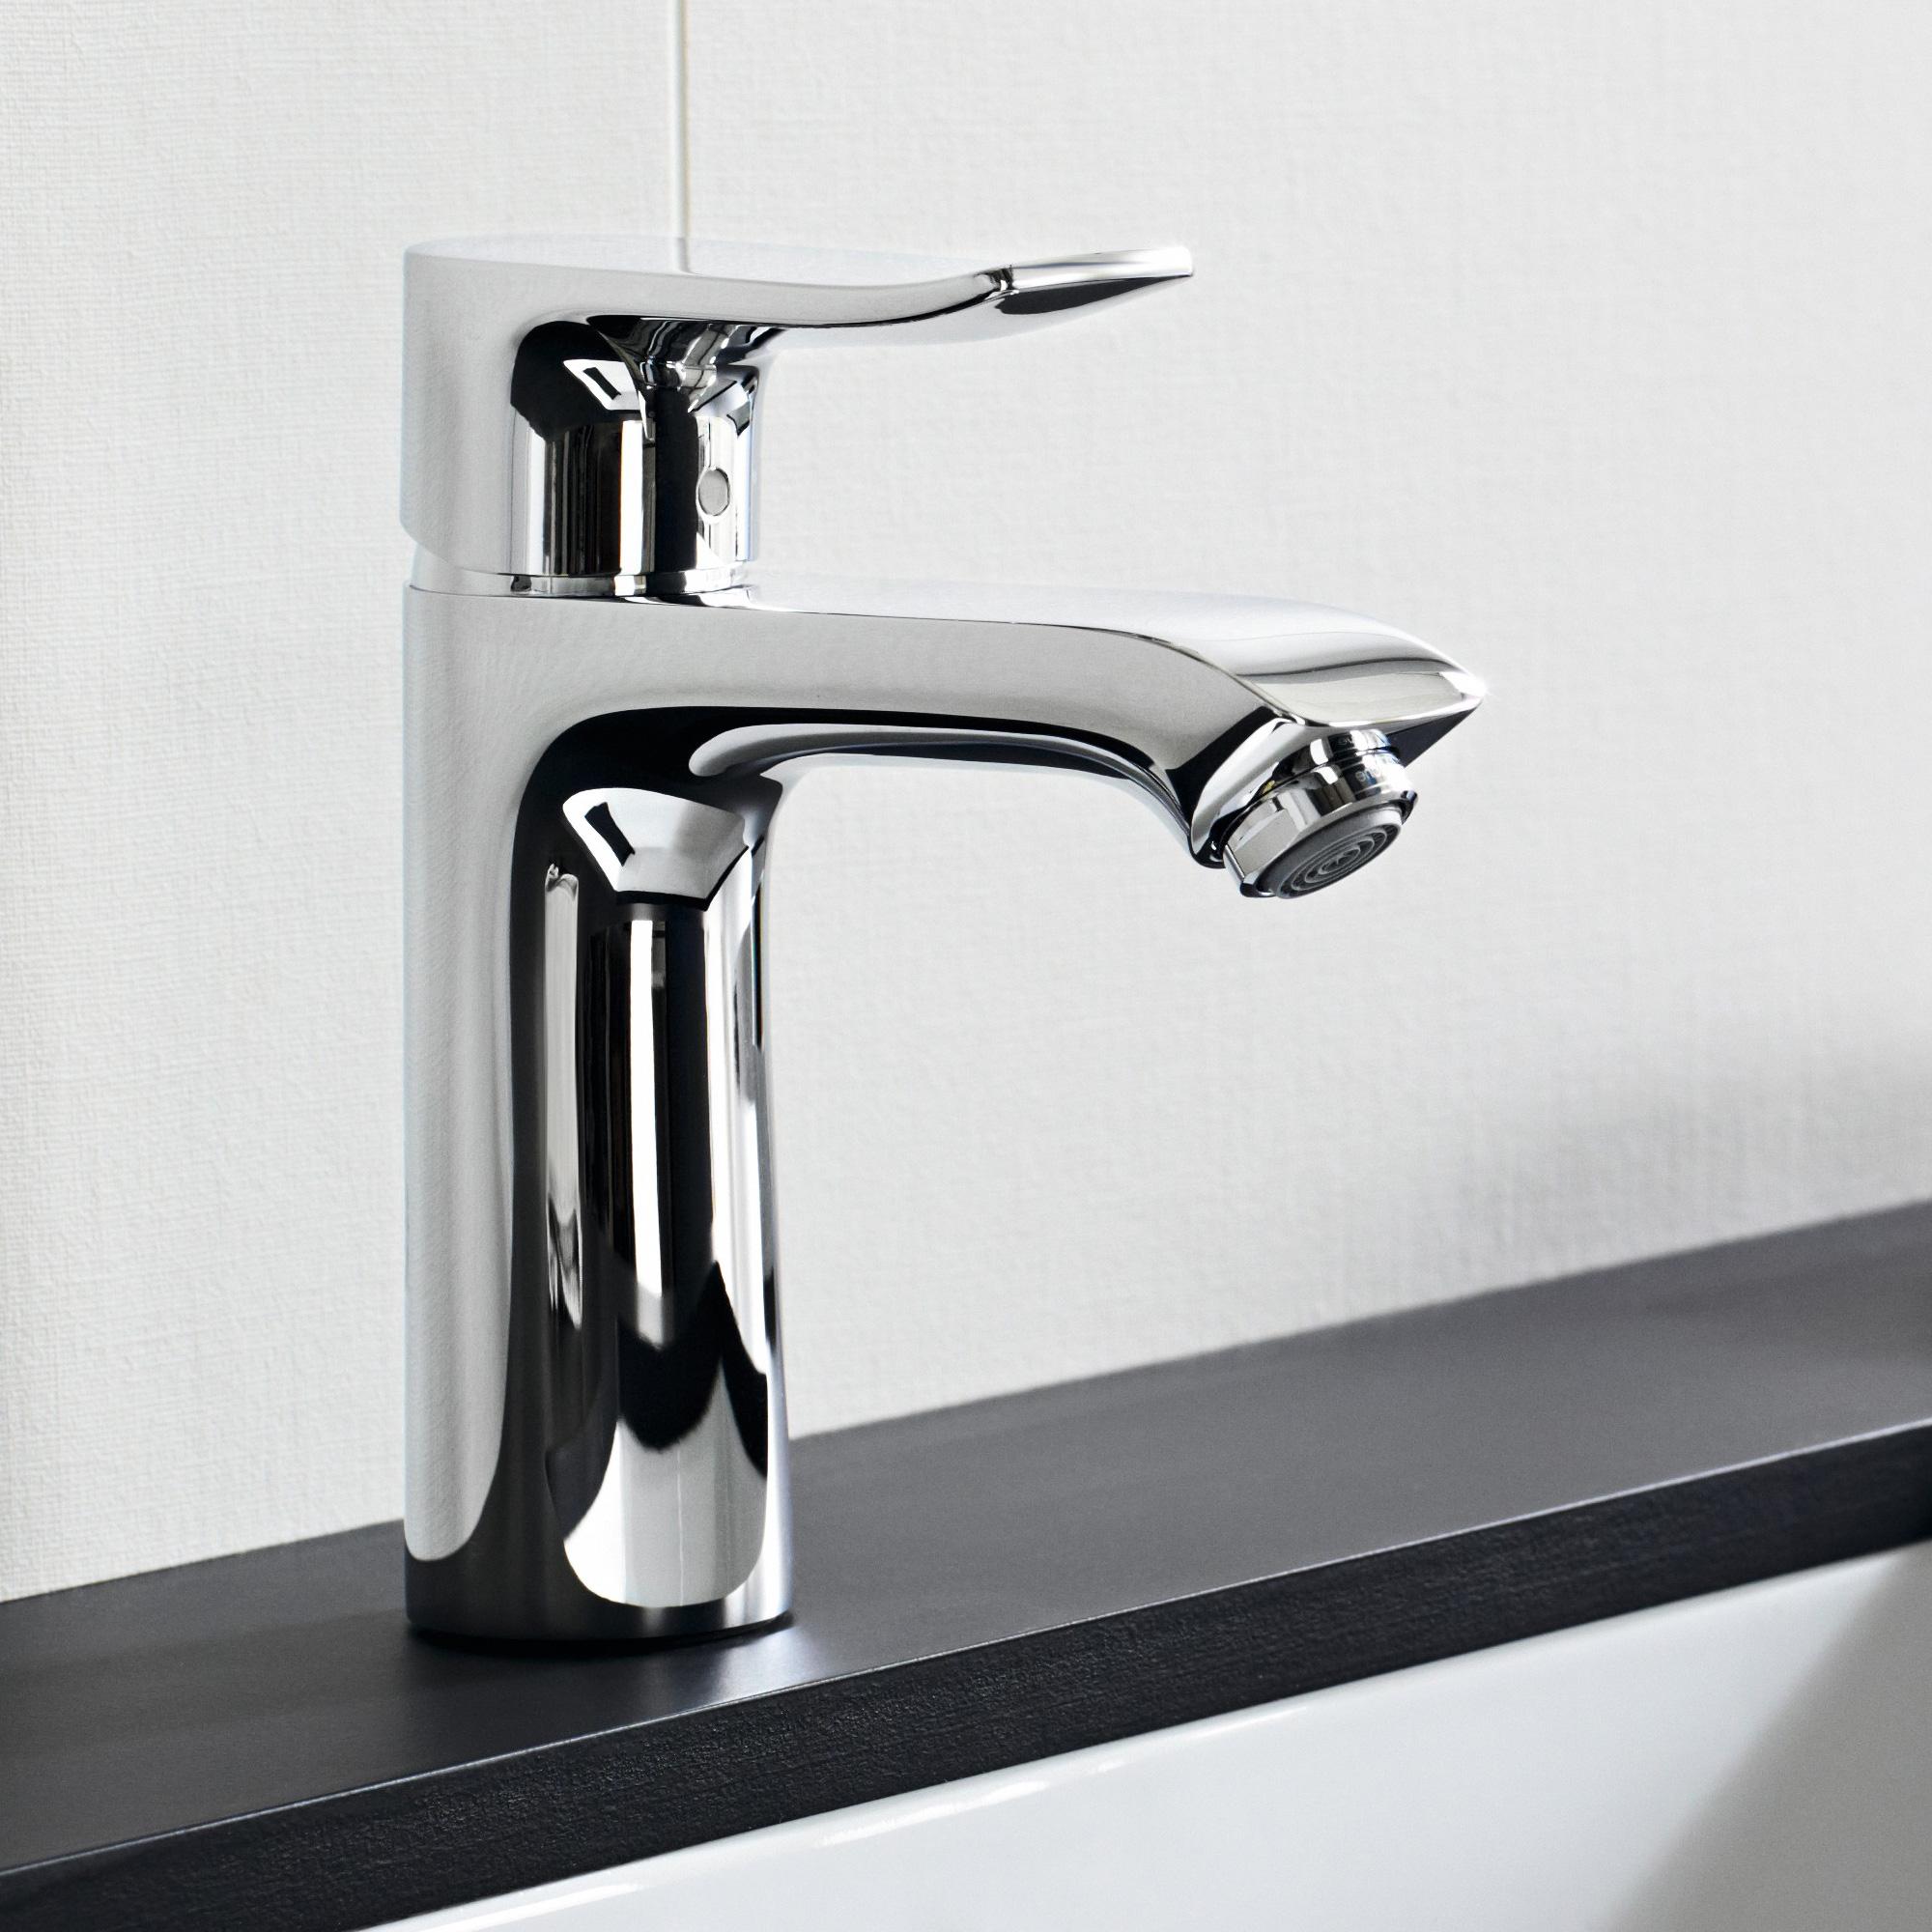 hansgrohe metris einhebel waschtischmischer 110 lowflow mit ablaufgarnitur 31203000 reuter. Black Bedroom Furniture Sets. Home Design Ideas